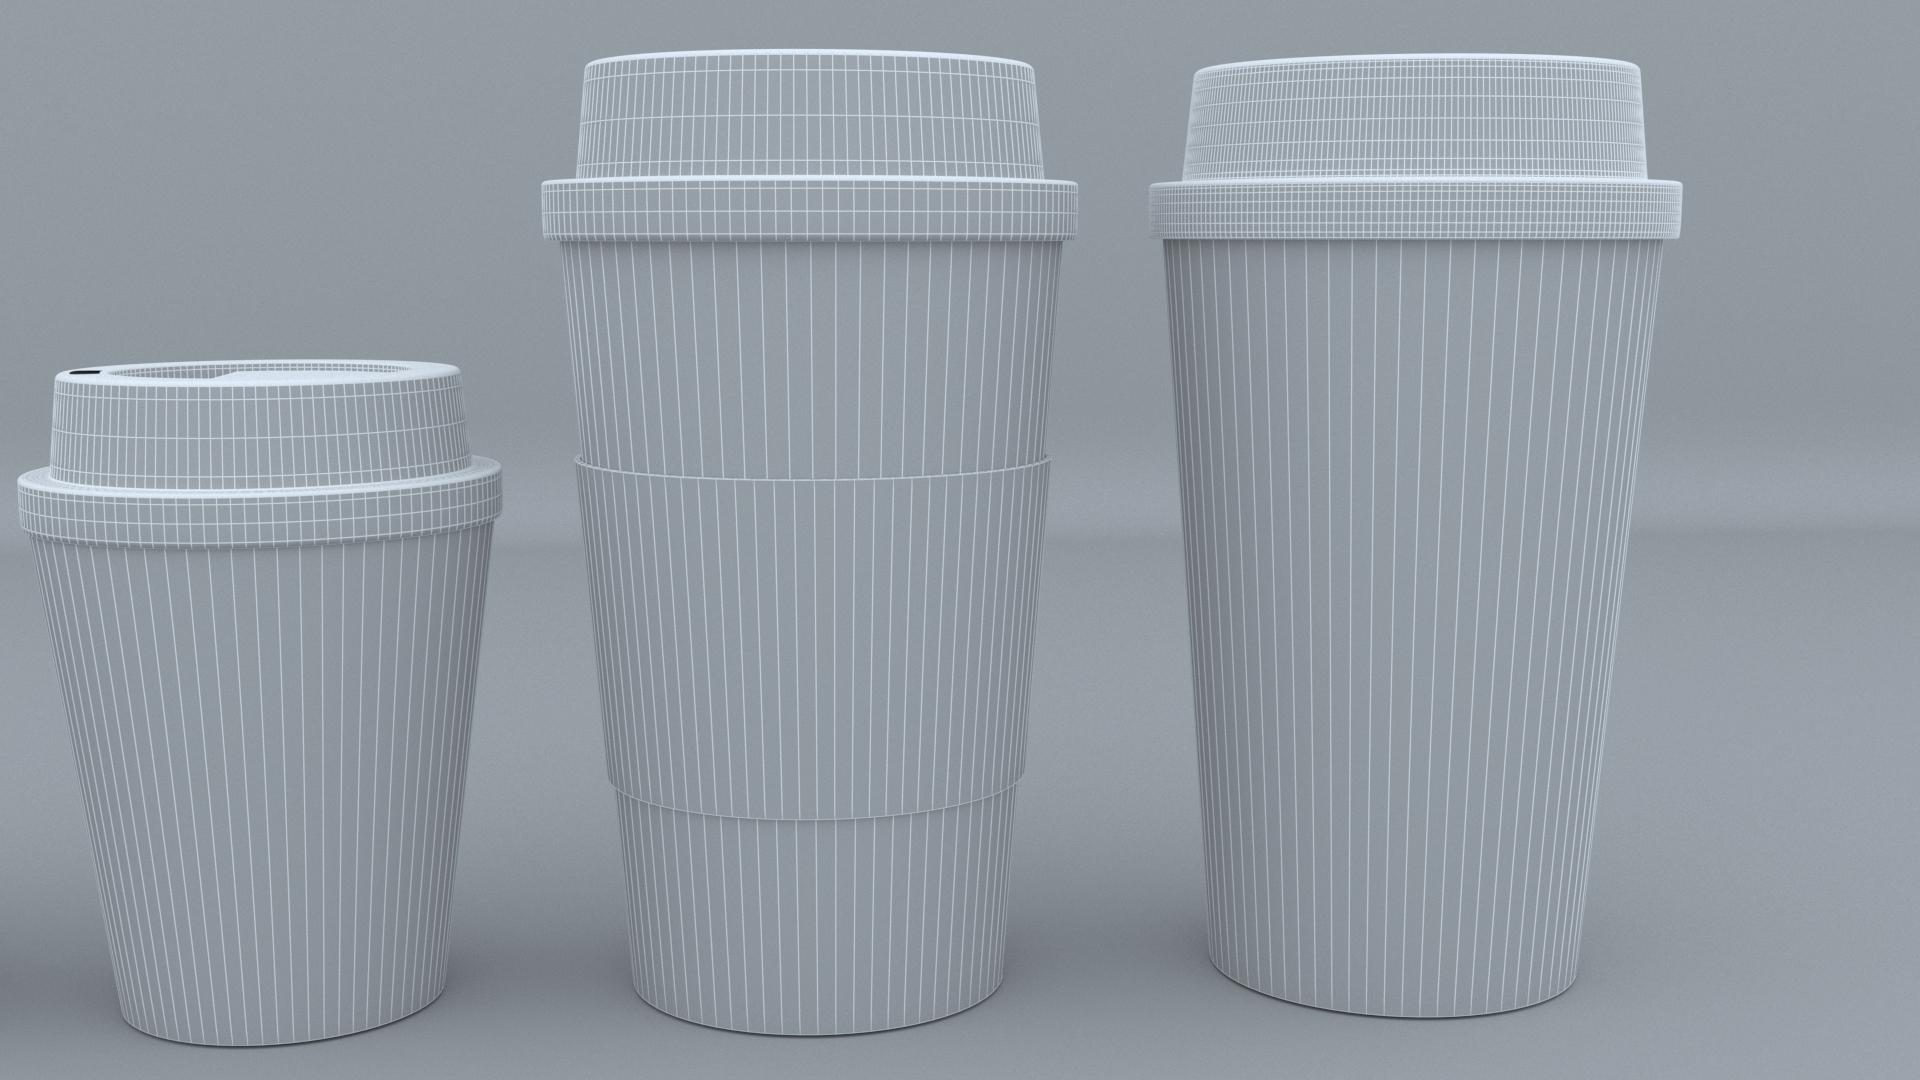 13.jpg Download STL file Coffee Cup • 3D printing template, illusioncreators1979